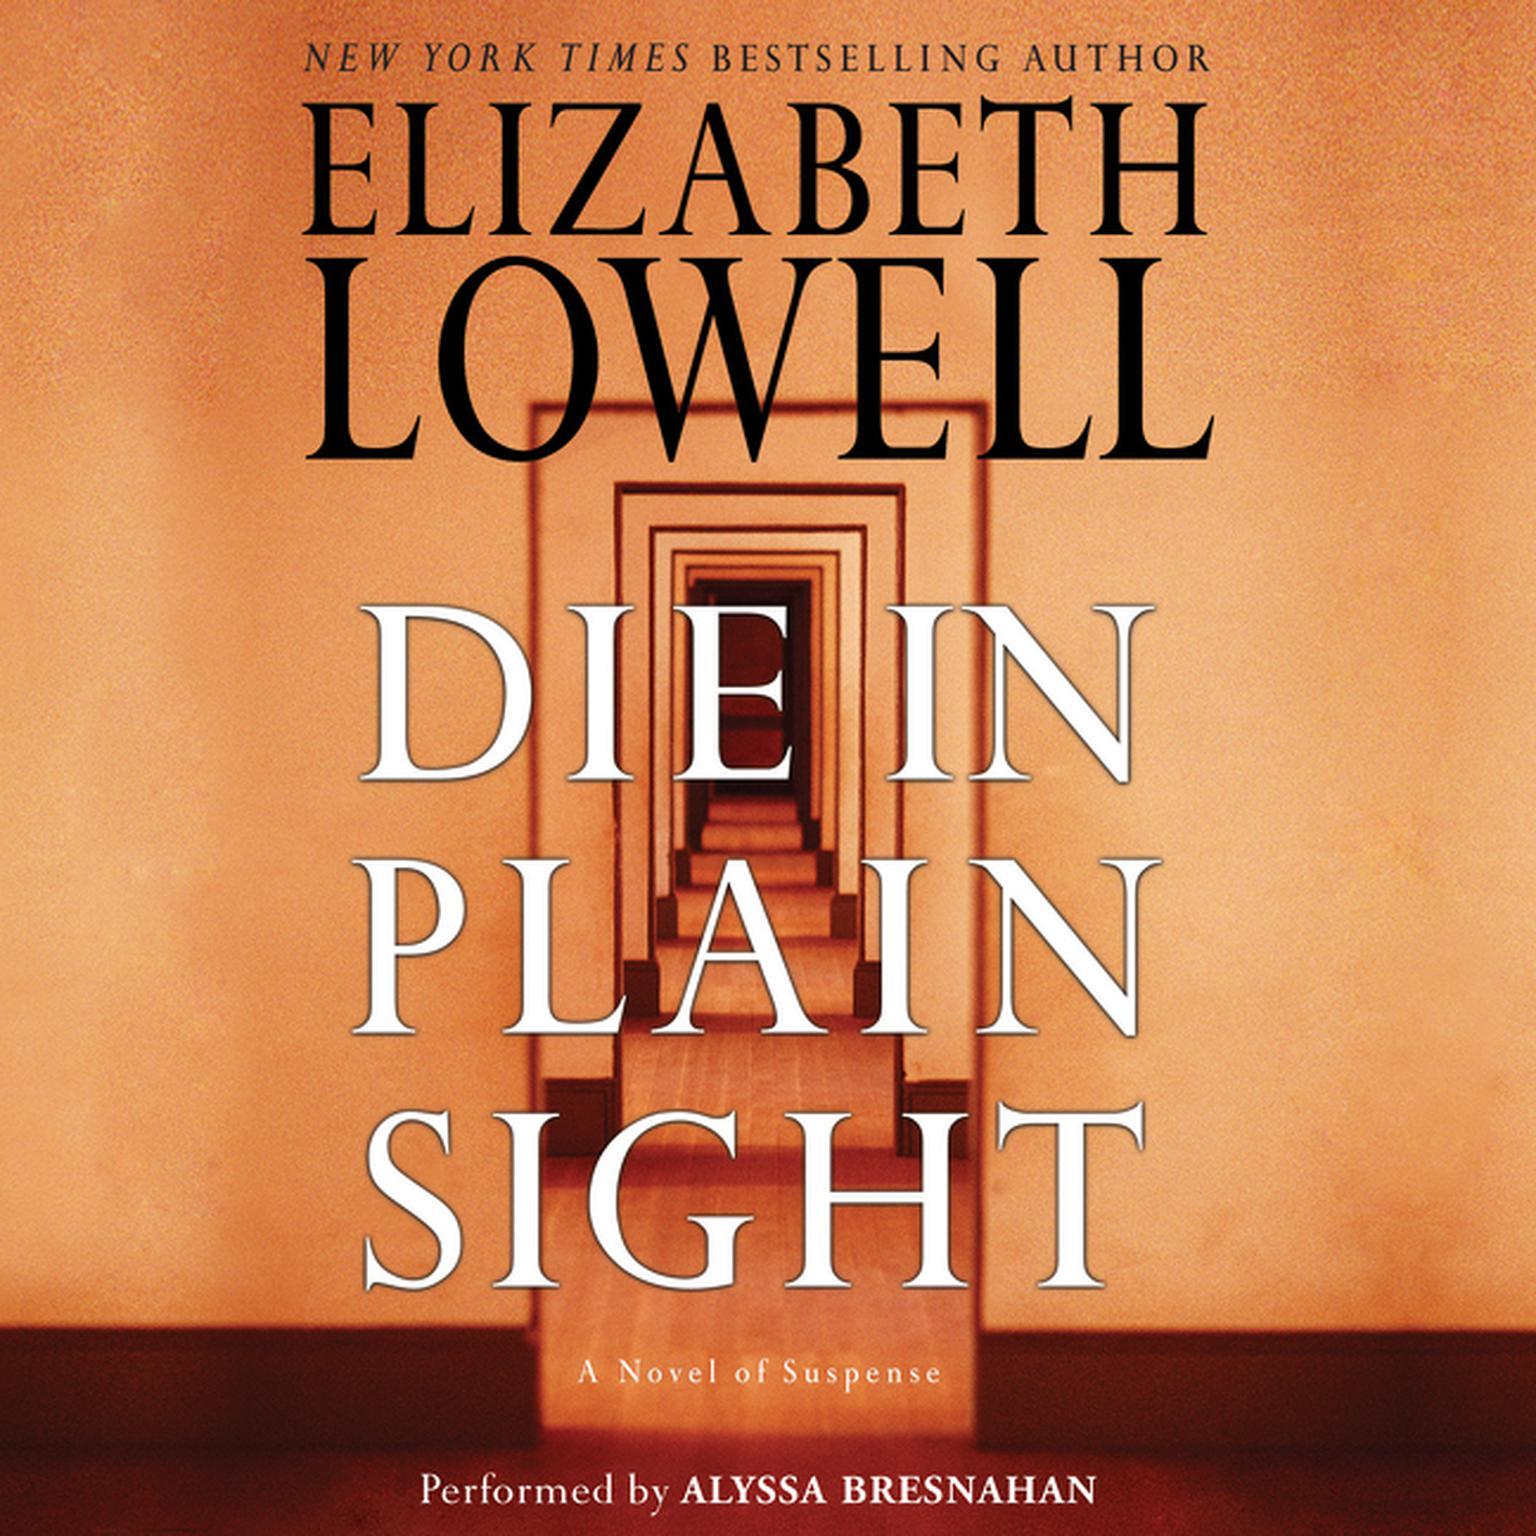 Die in Plain Sight: A Novel of Suspense Audiobook, by Elizabeth Lowell